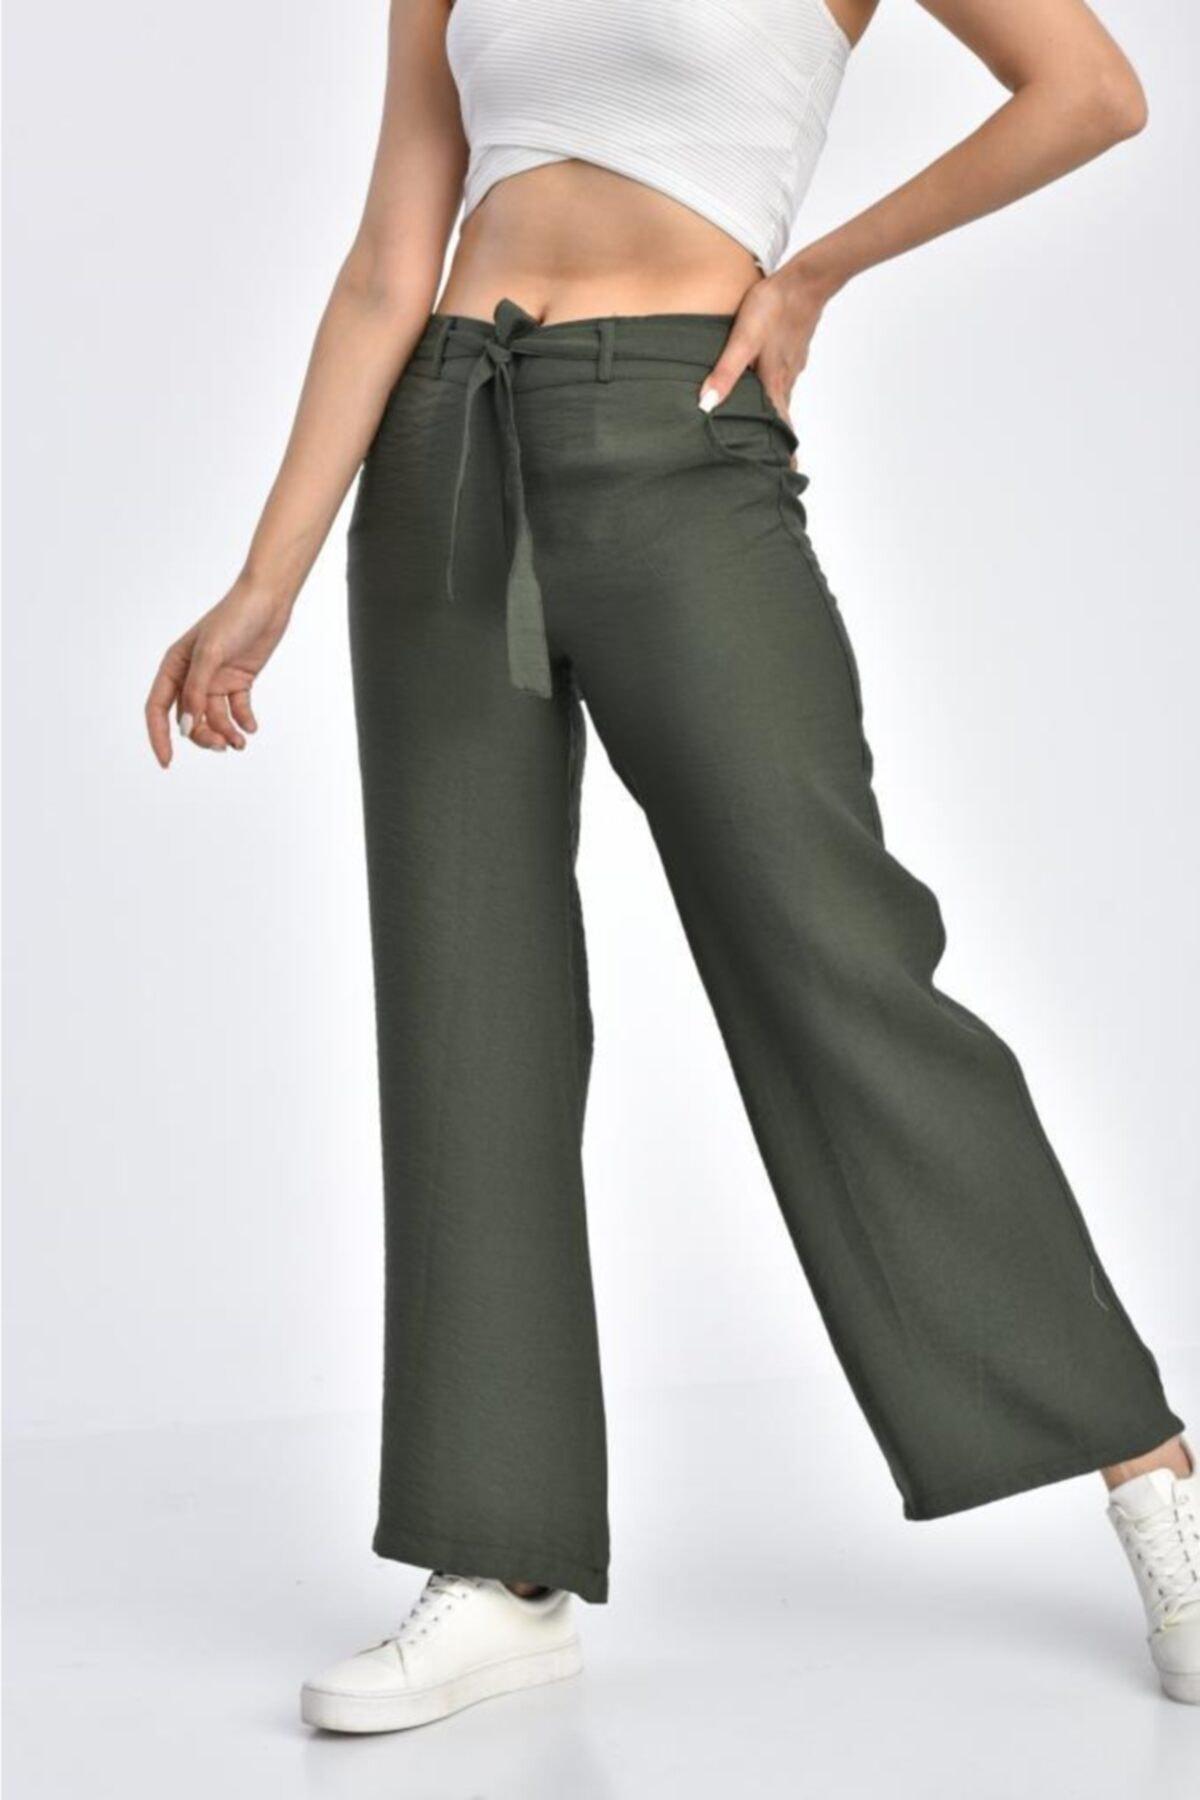 Modkofoni Haki Pantolon Belden Lastikli Kuşaklı Bol Paça Haki Keten Pantolon 2